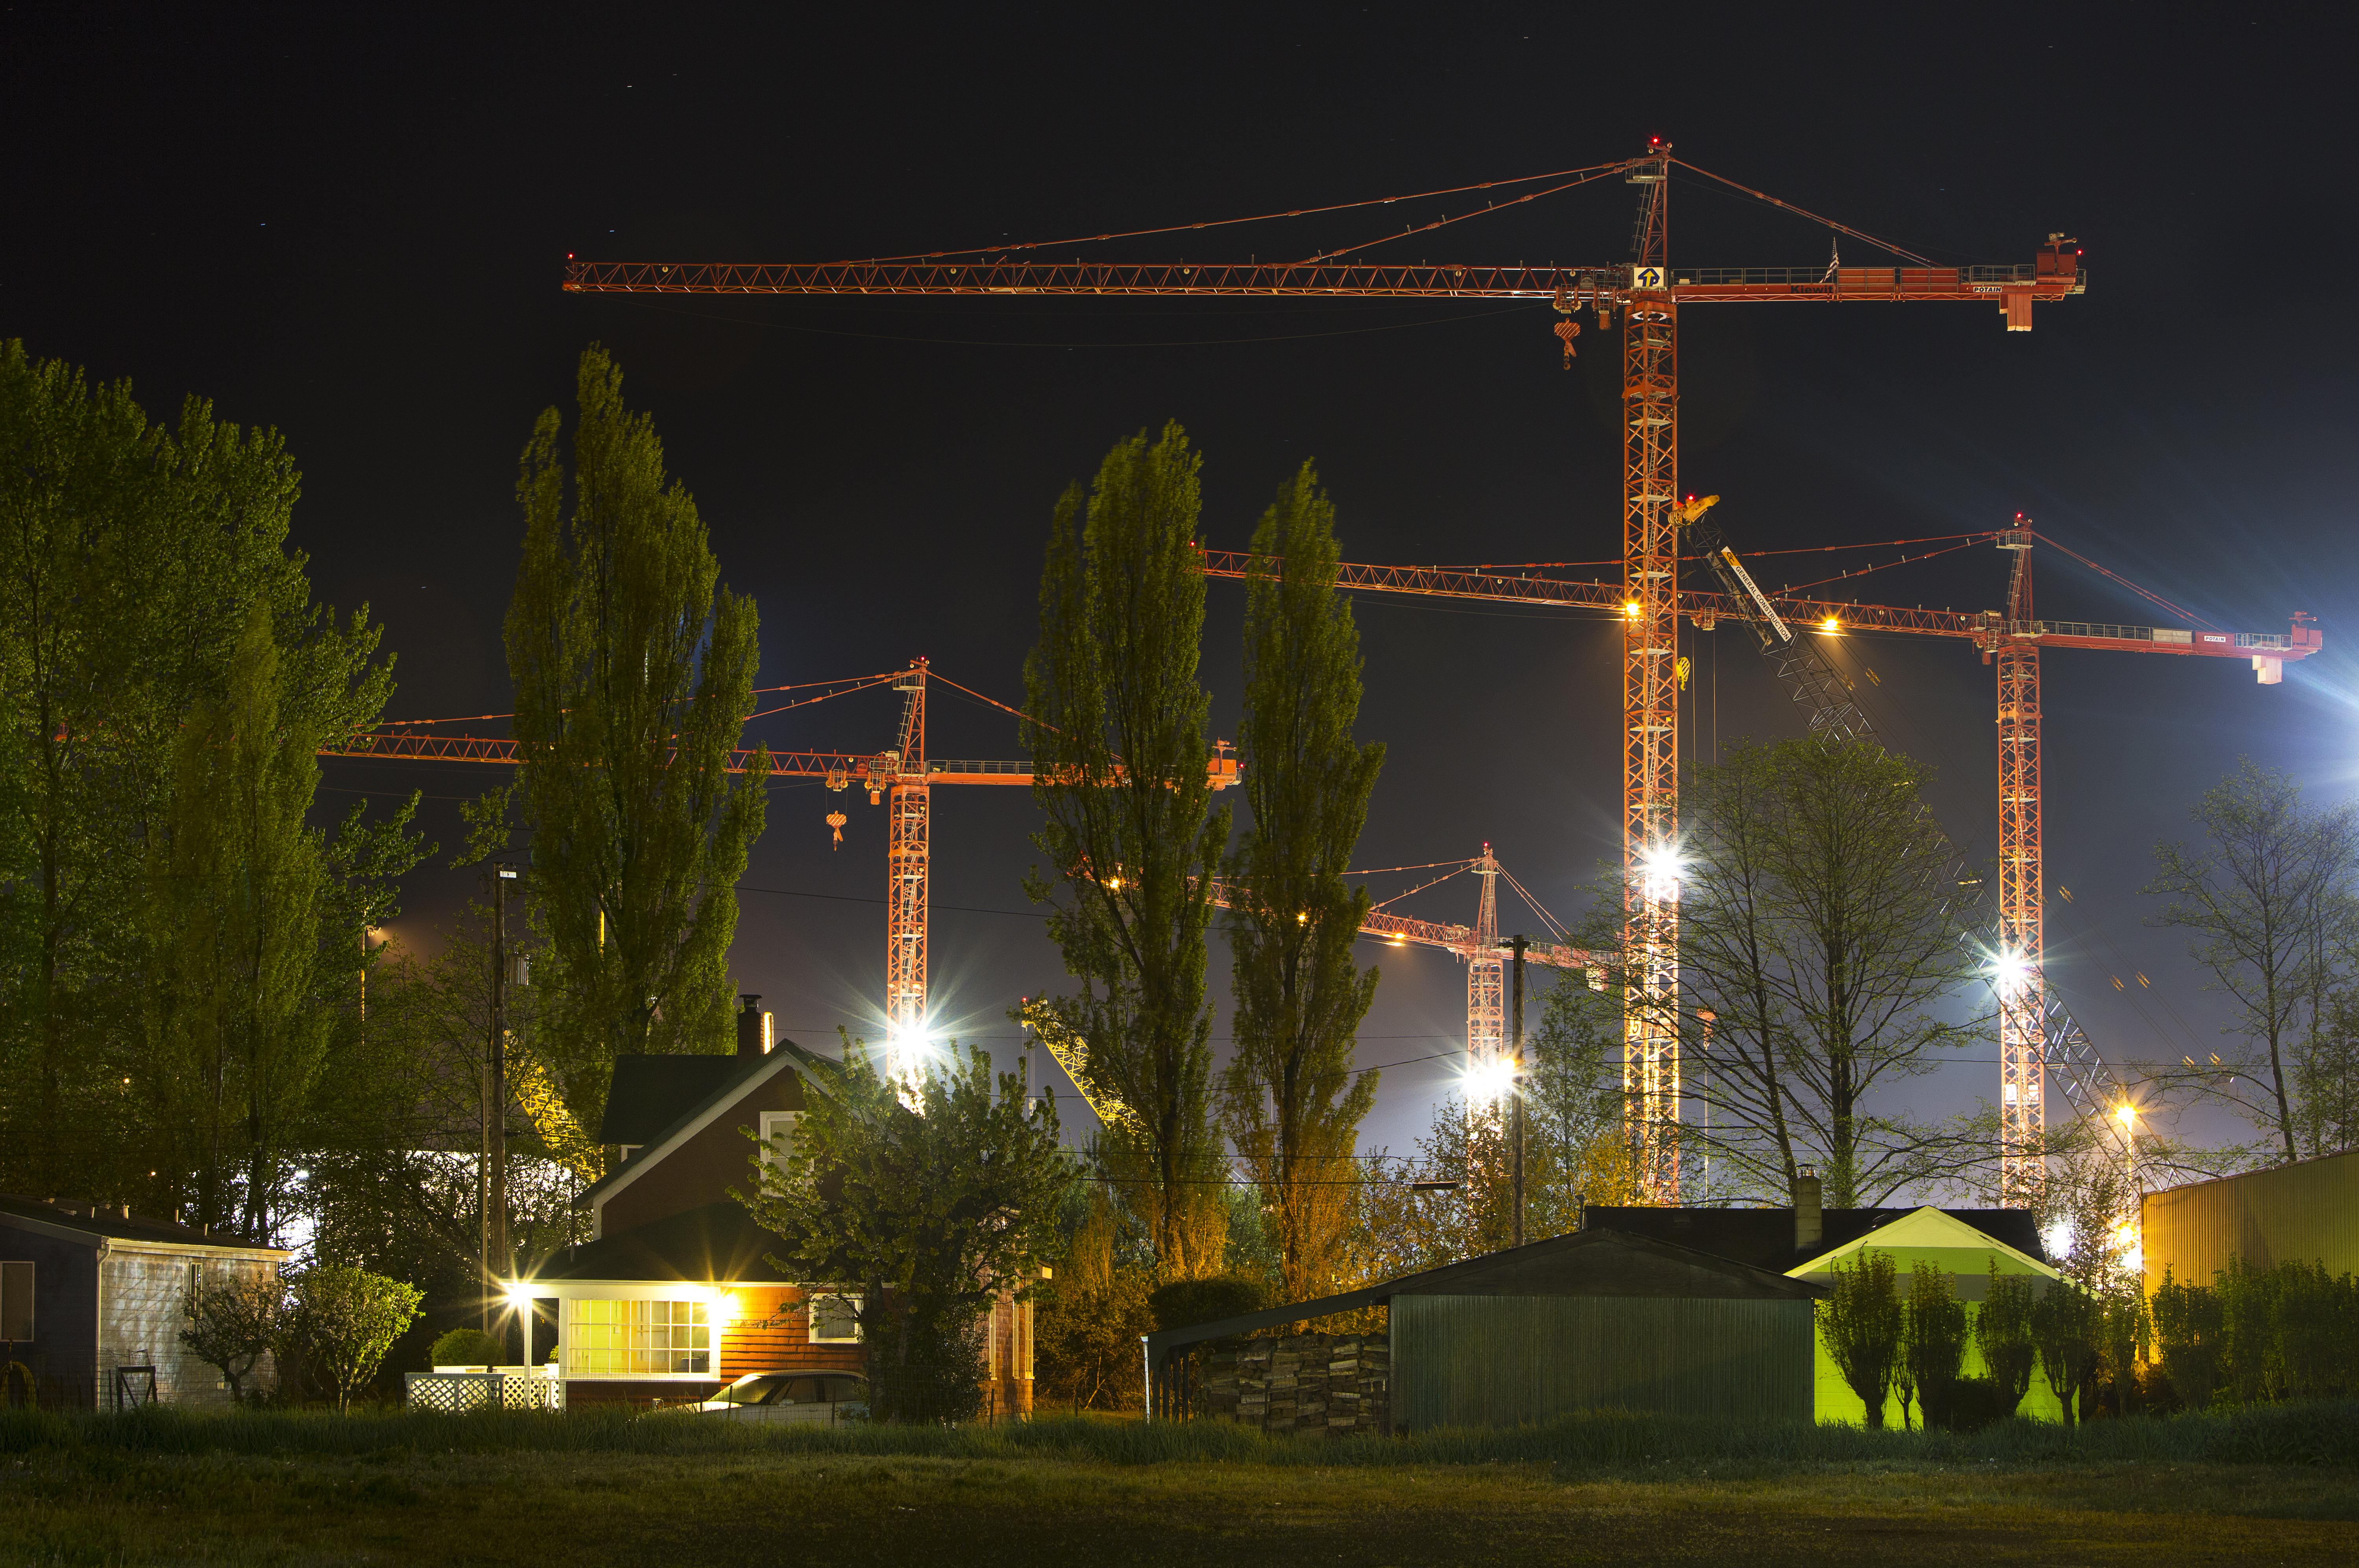 After Dark - Cranes